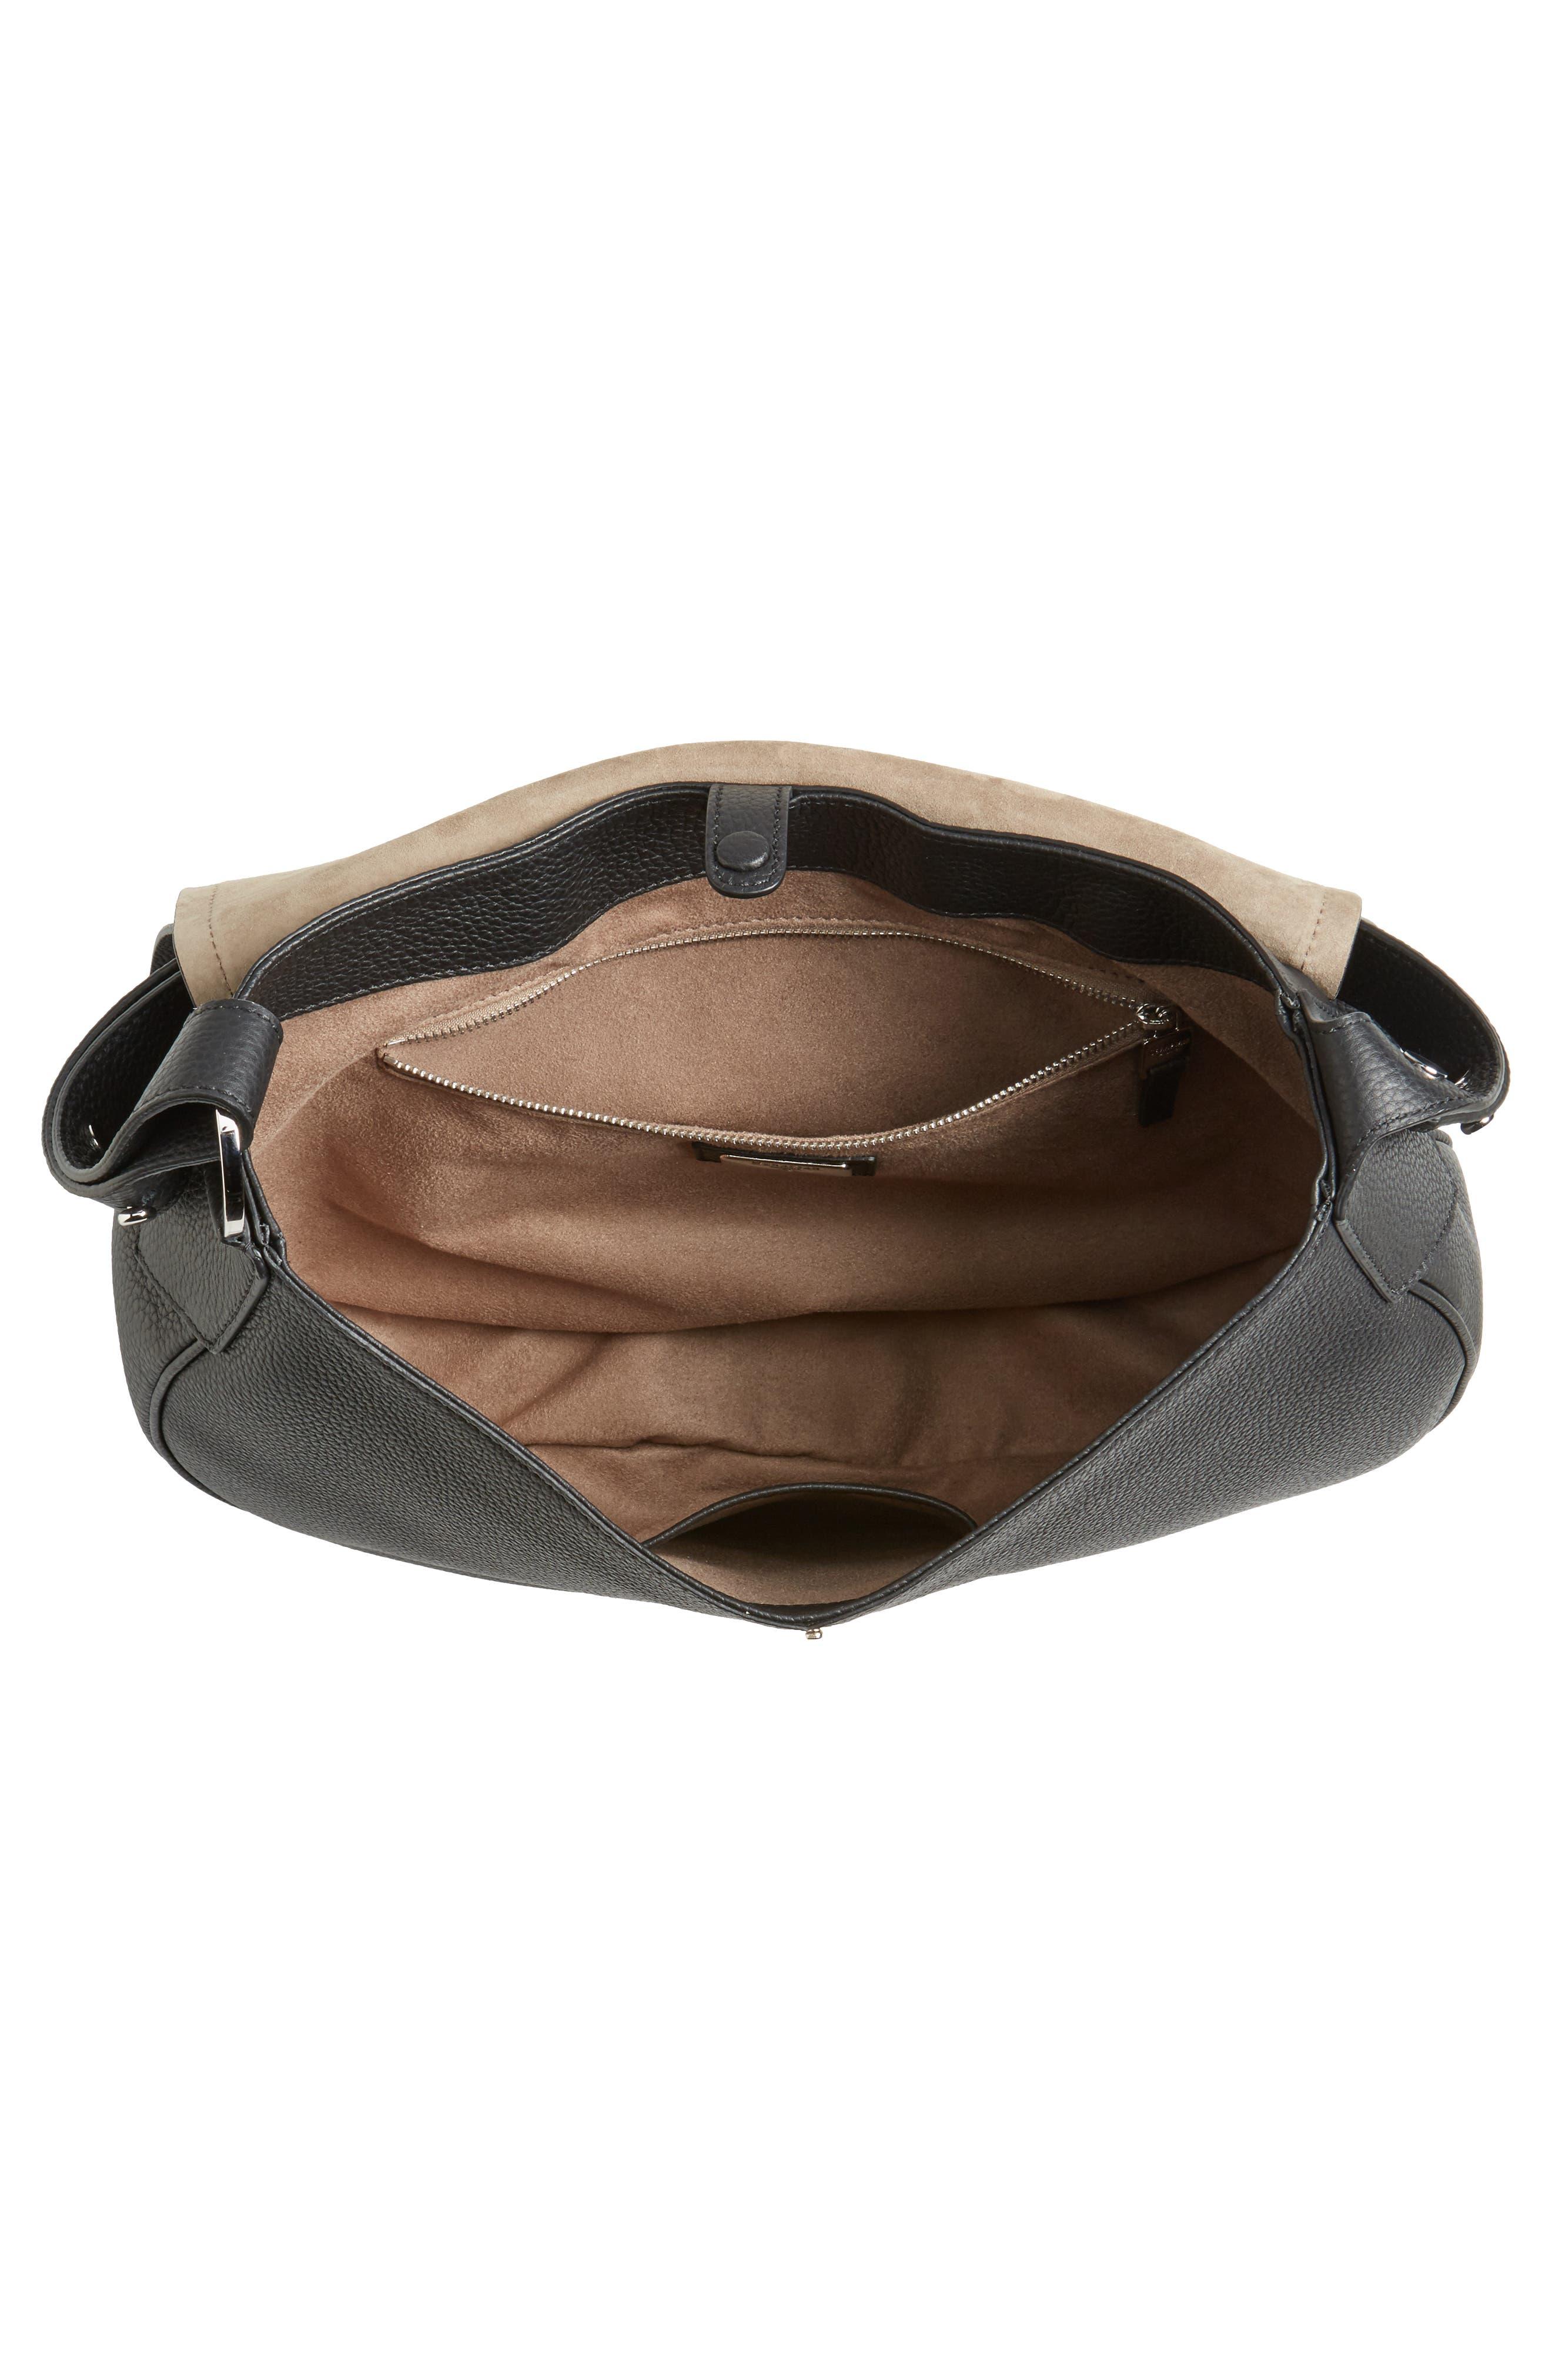 Valeria Cachemire Leather Saddle Bag,                             Alternate thumbnail 4, color,                             001